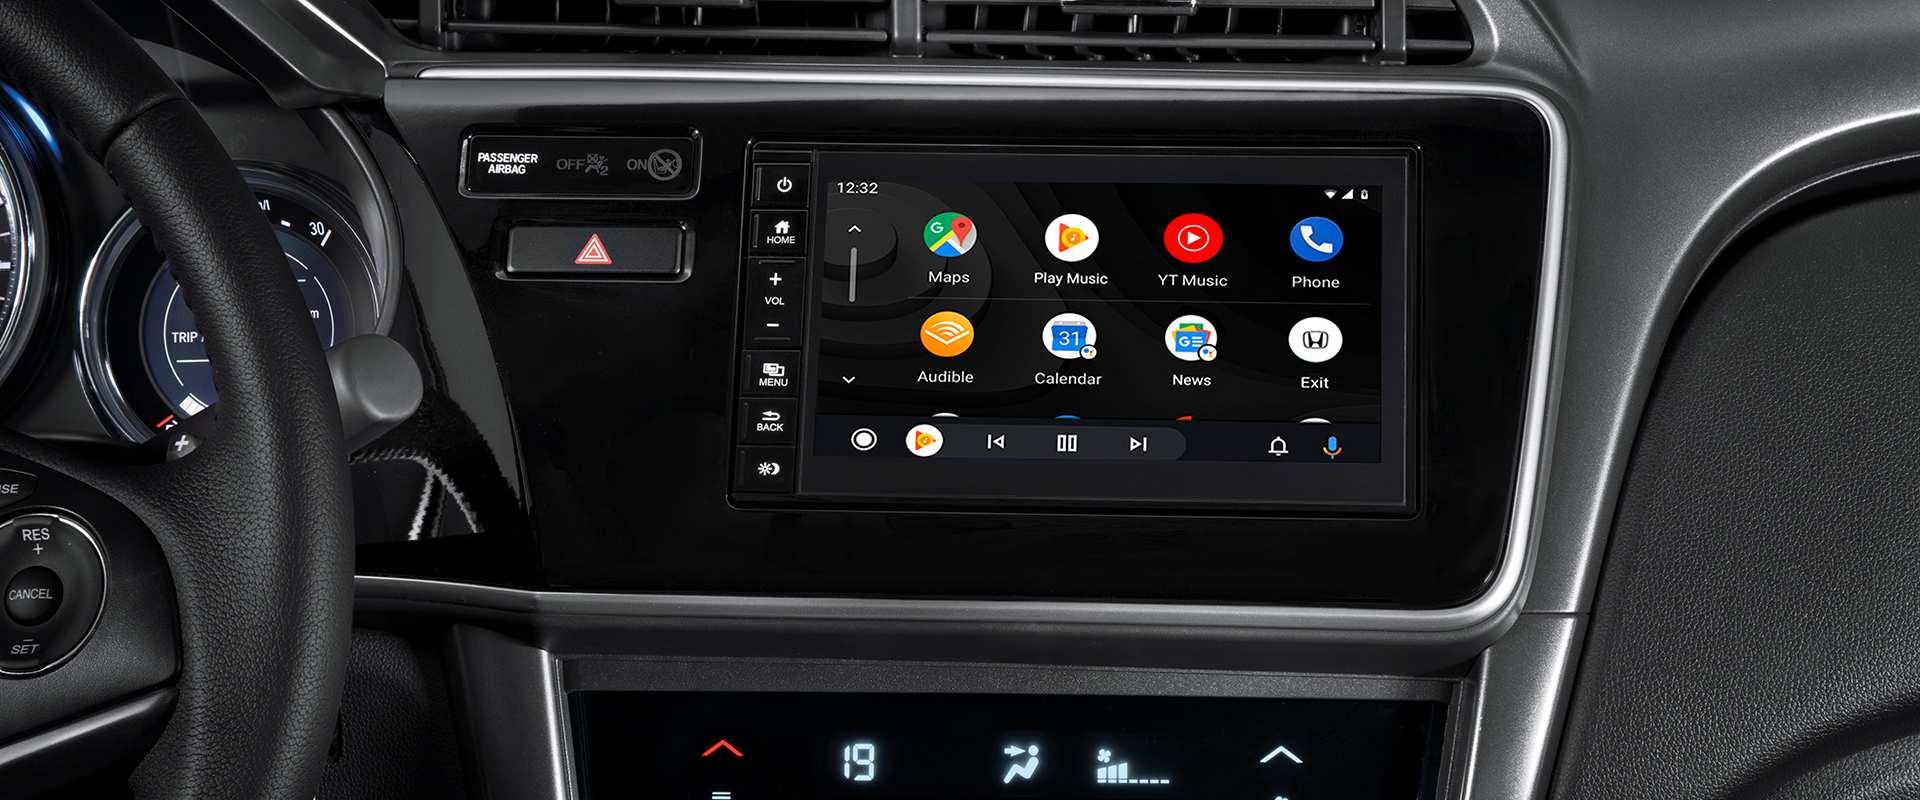 Multimídia 7'' multi-touchscreen com interfaces Android Auto™  para smartphone